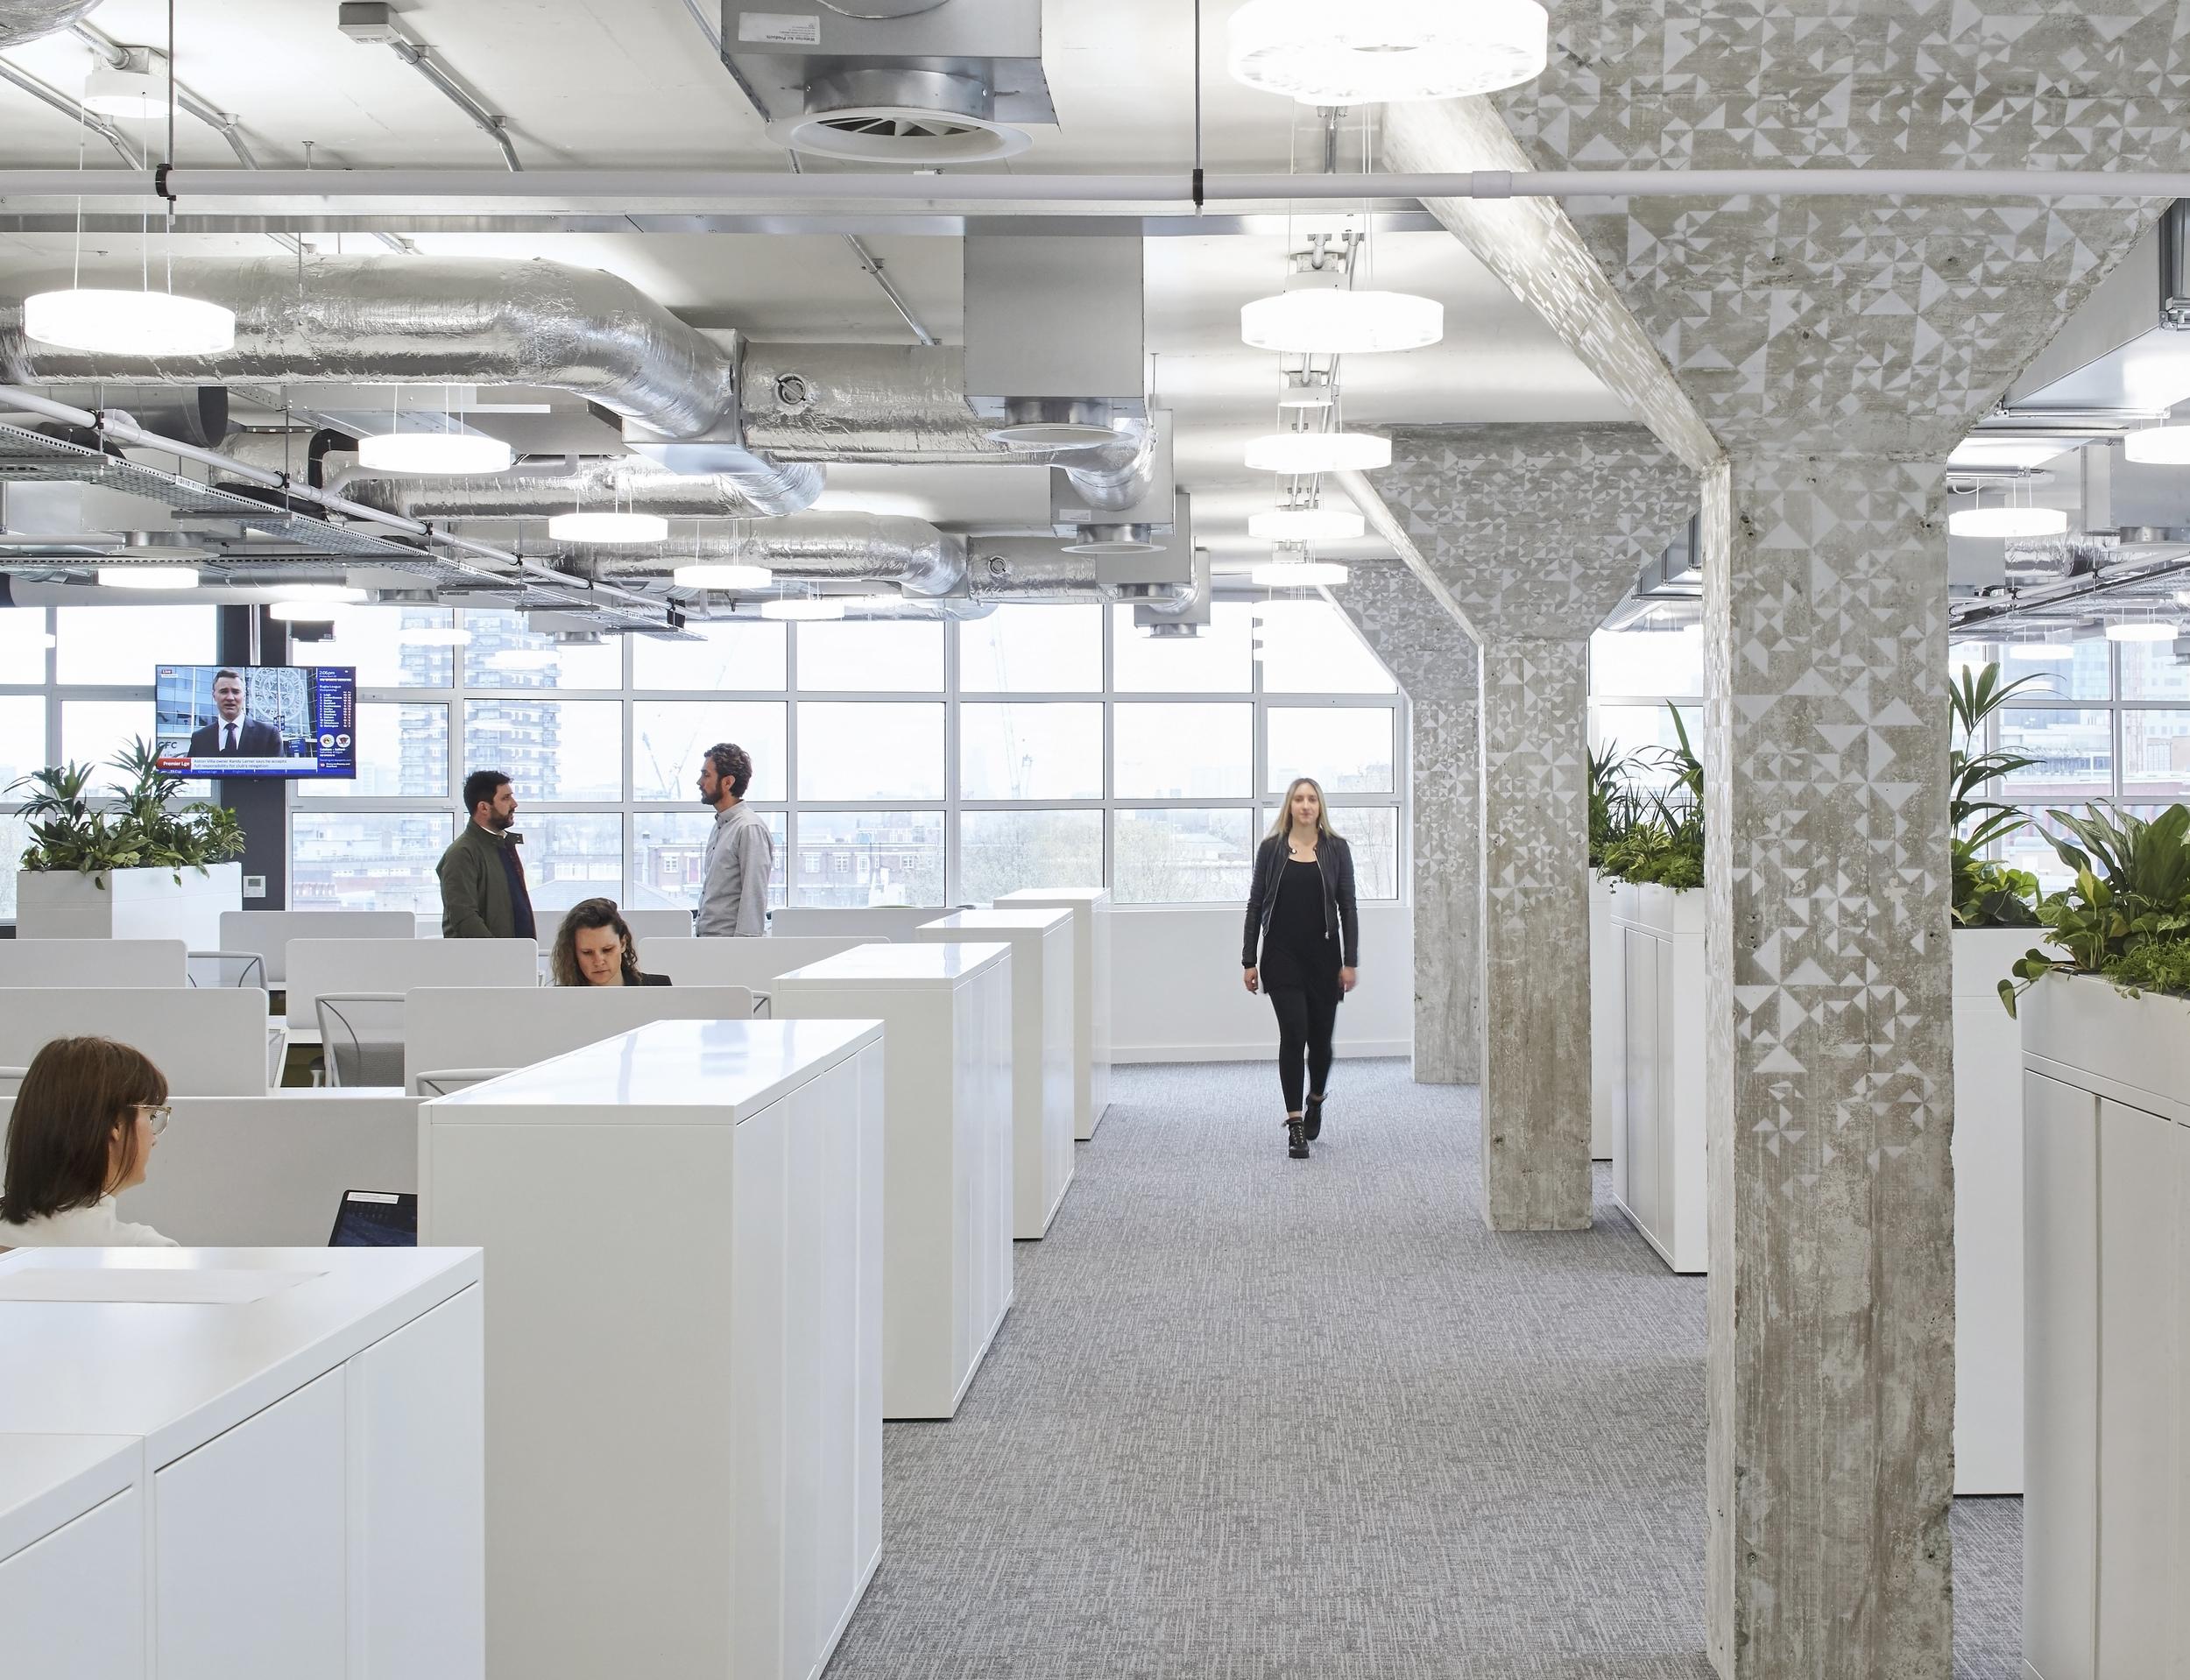 HLW_SKY offices_Brick Lane_-®Hufton+Crow_001.jpg